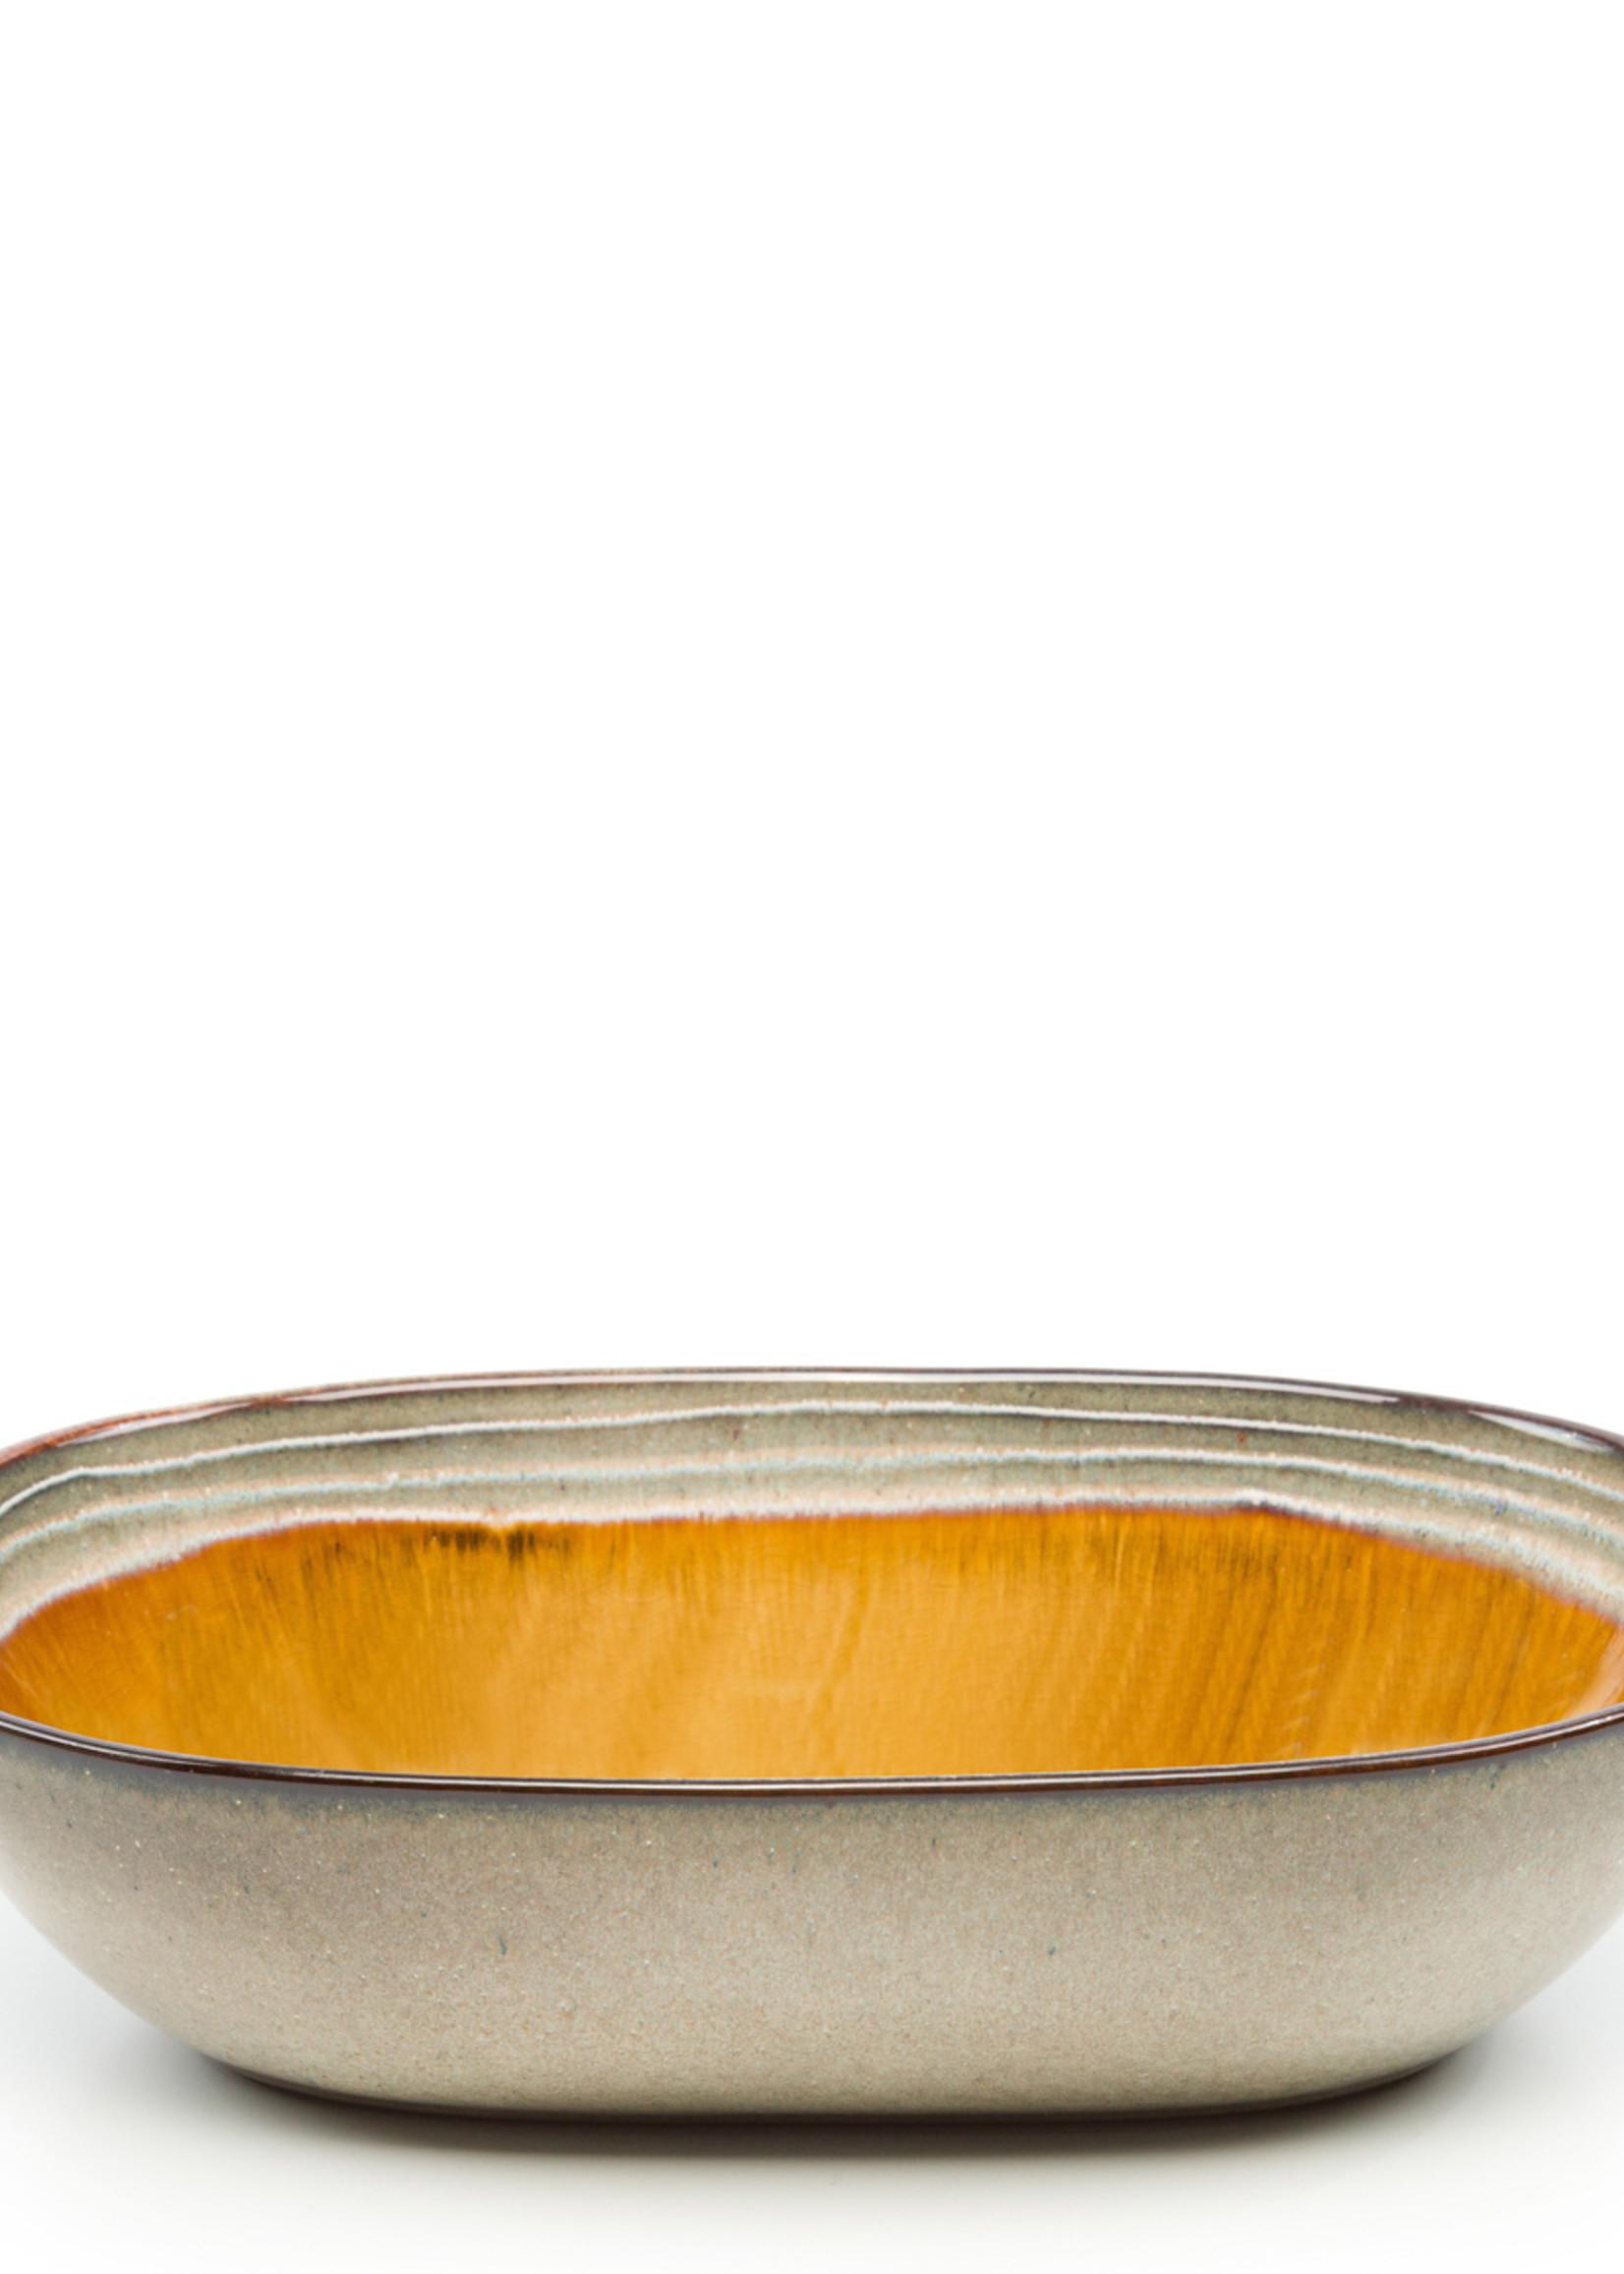 The Comporta Oval Bowl - L